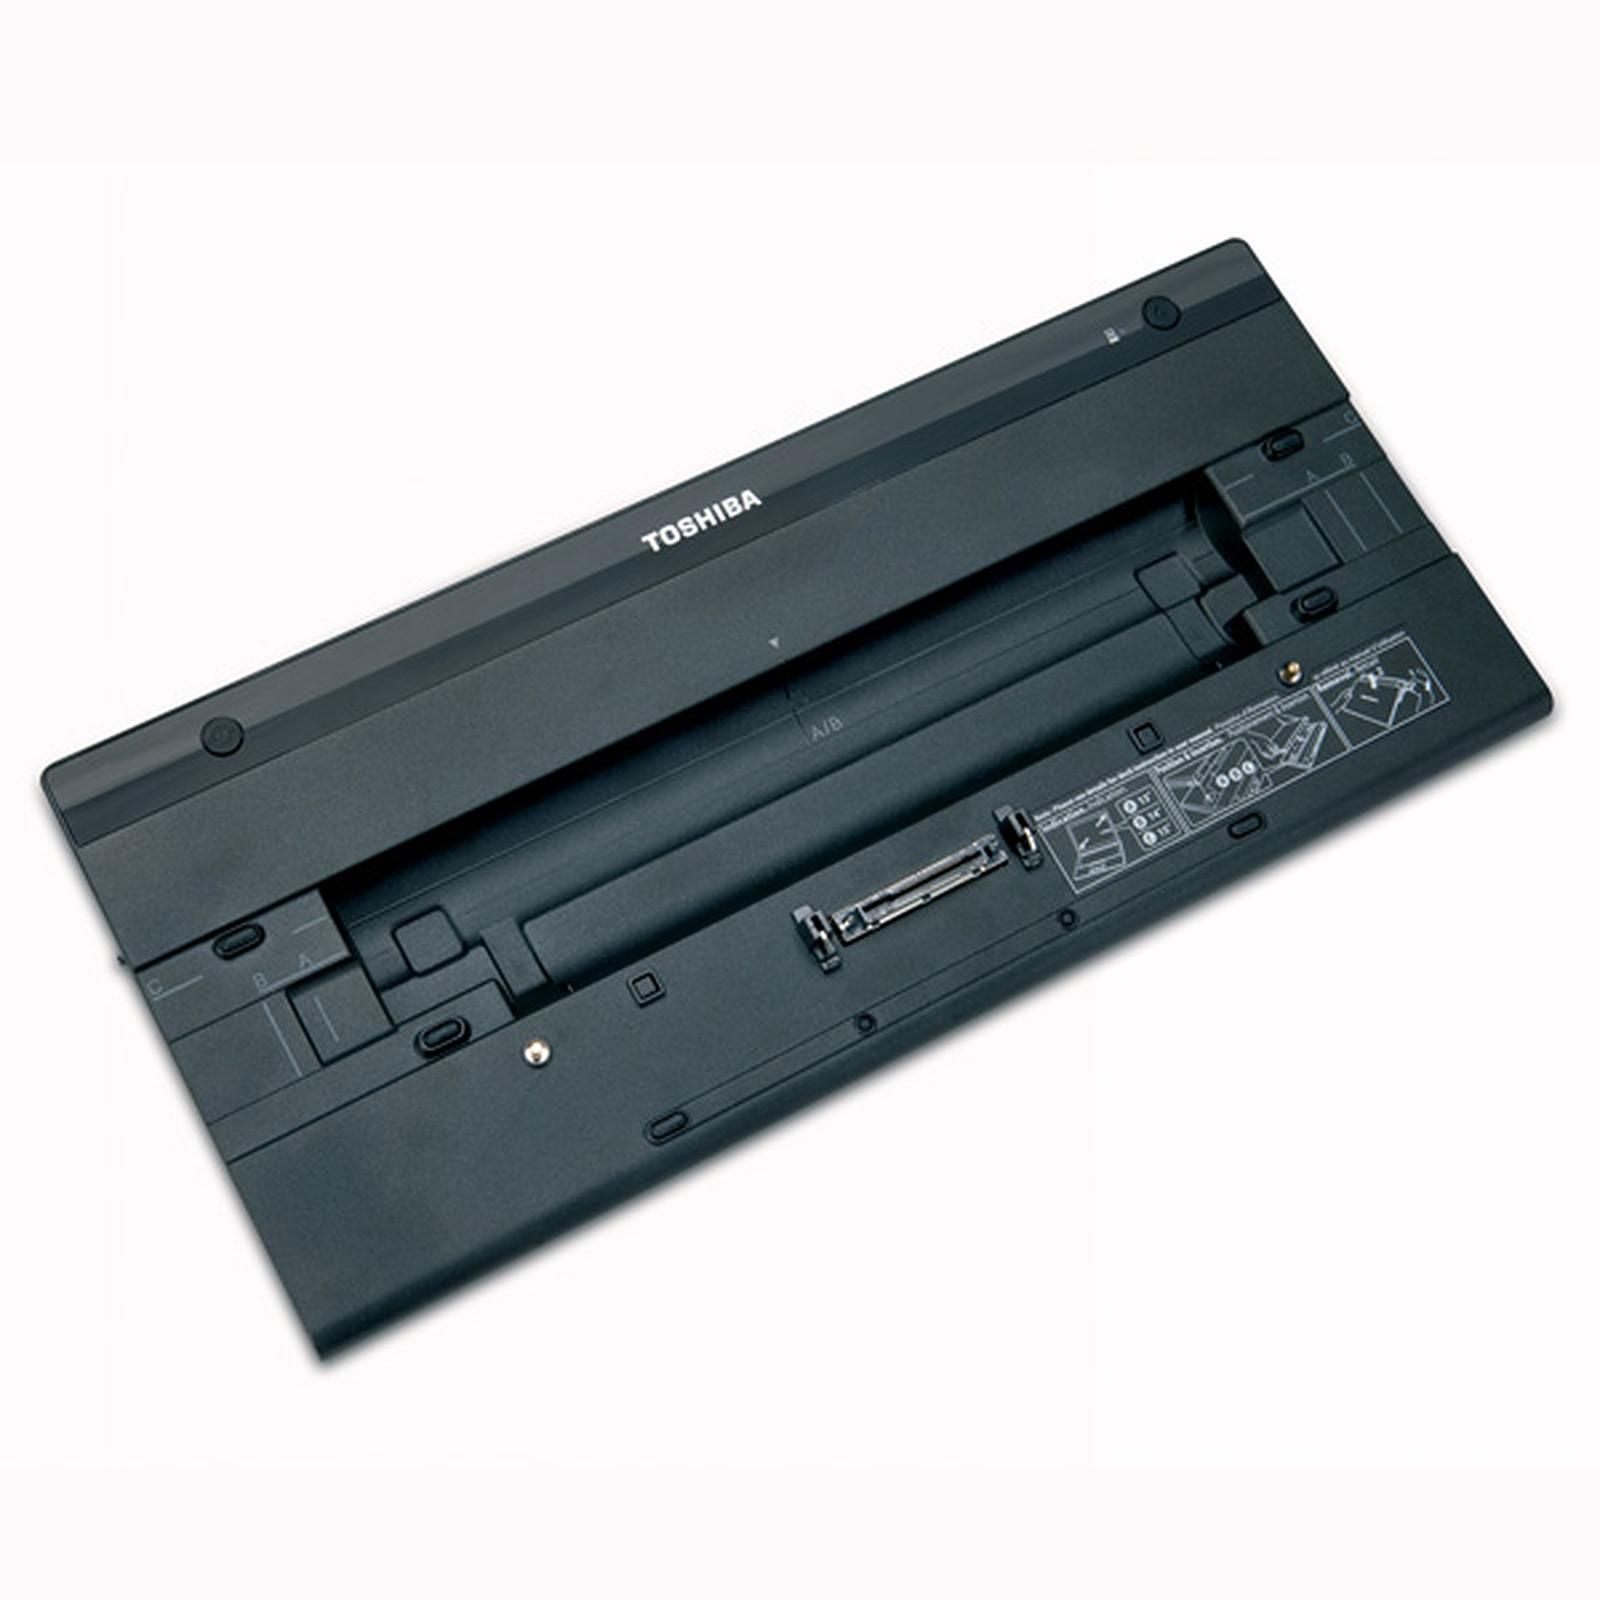 Toshiba Hi Speed Port Replicator II (connecteur 2-pin)